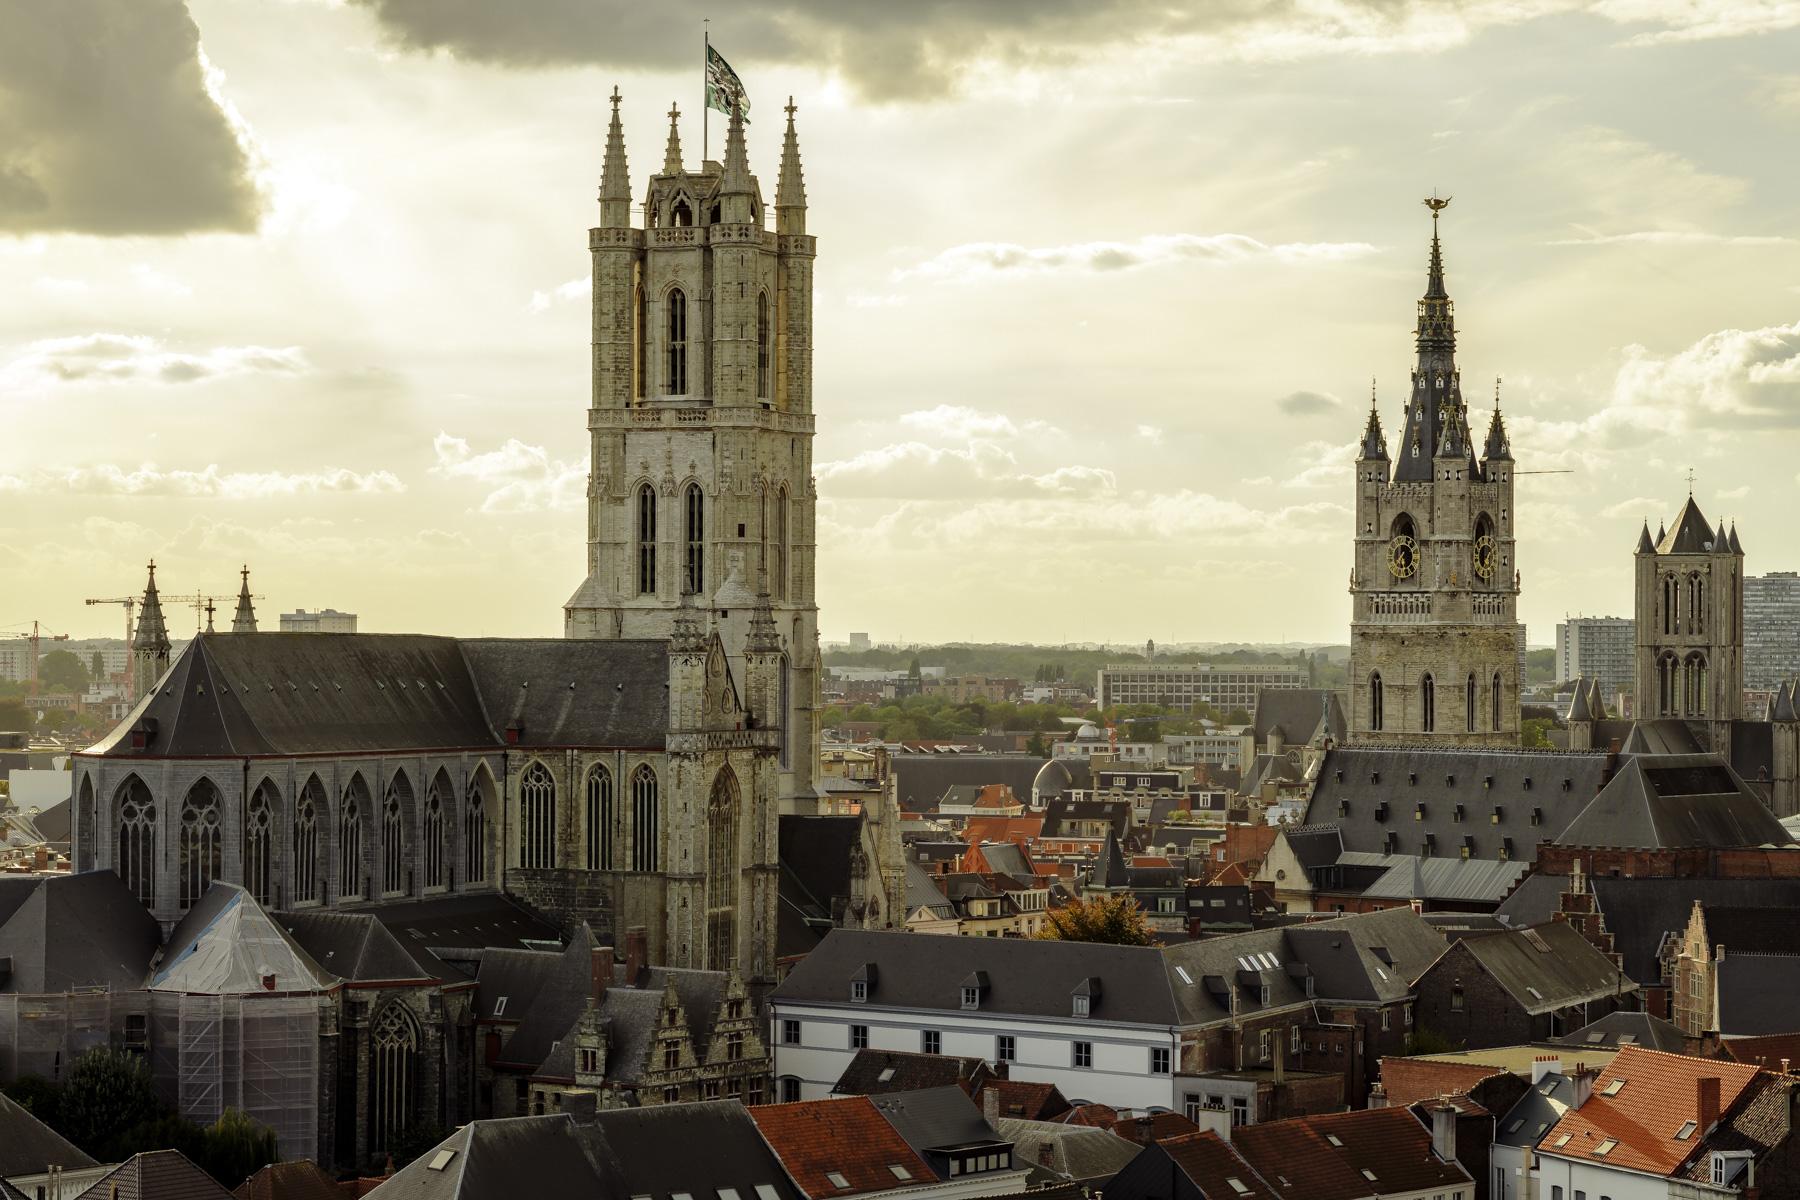 © Stad Gent/Olmo Peeters